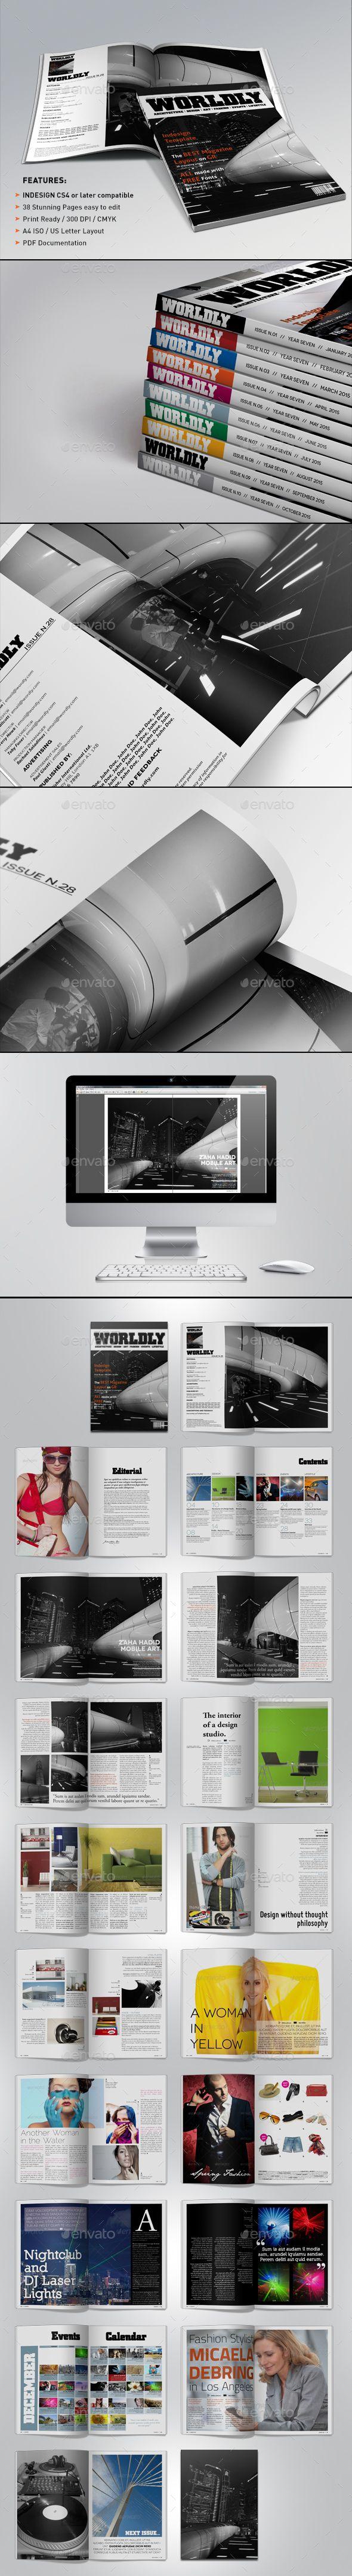 Wordly Magazine Indesign Template - Magazines Print Templates